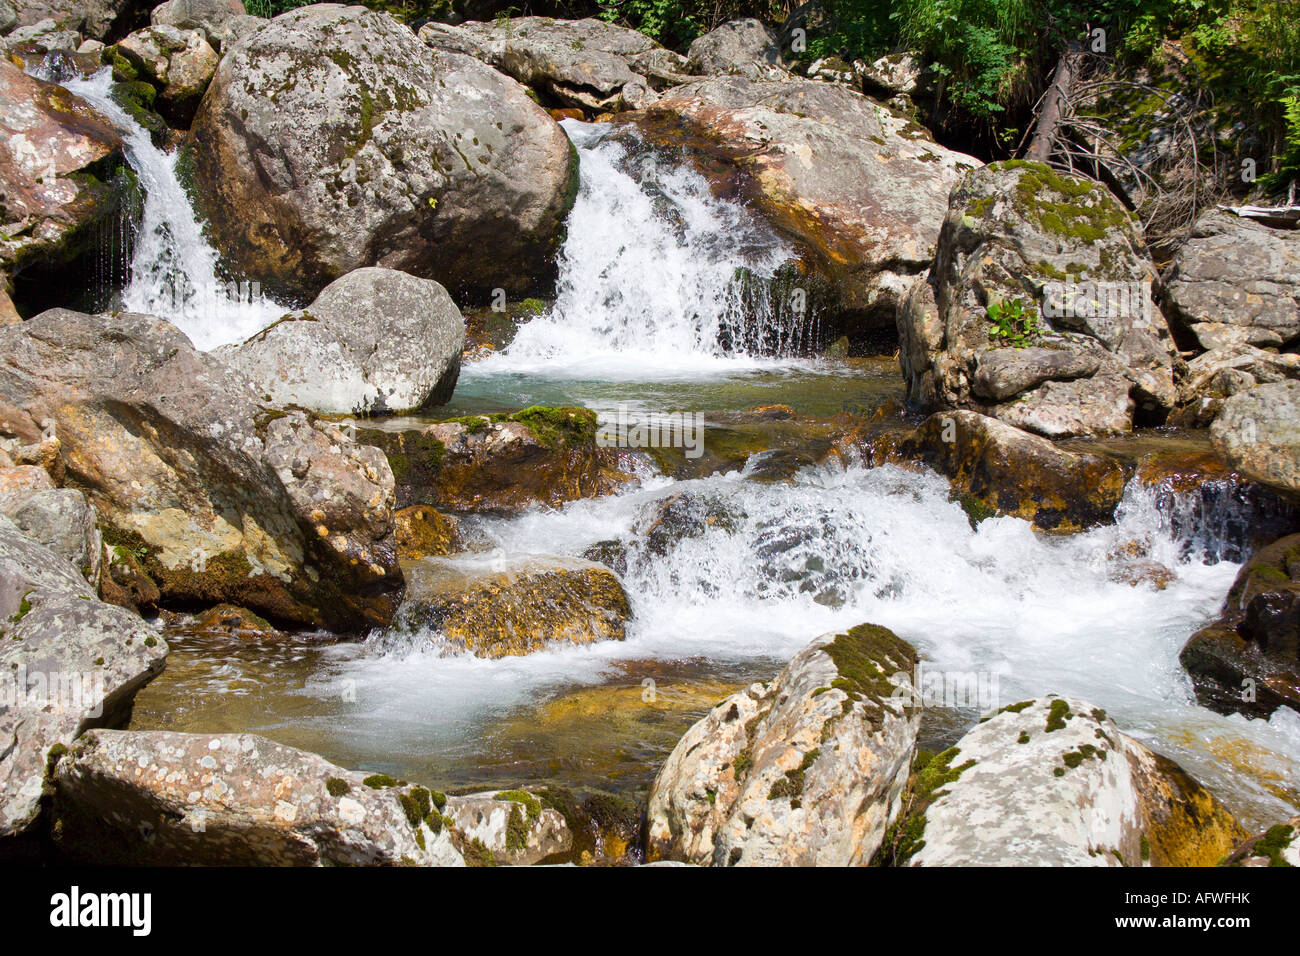 mountain stream running over mossy rocks in siberia foothills of Sayan s mountain range - Stock Image